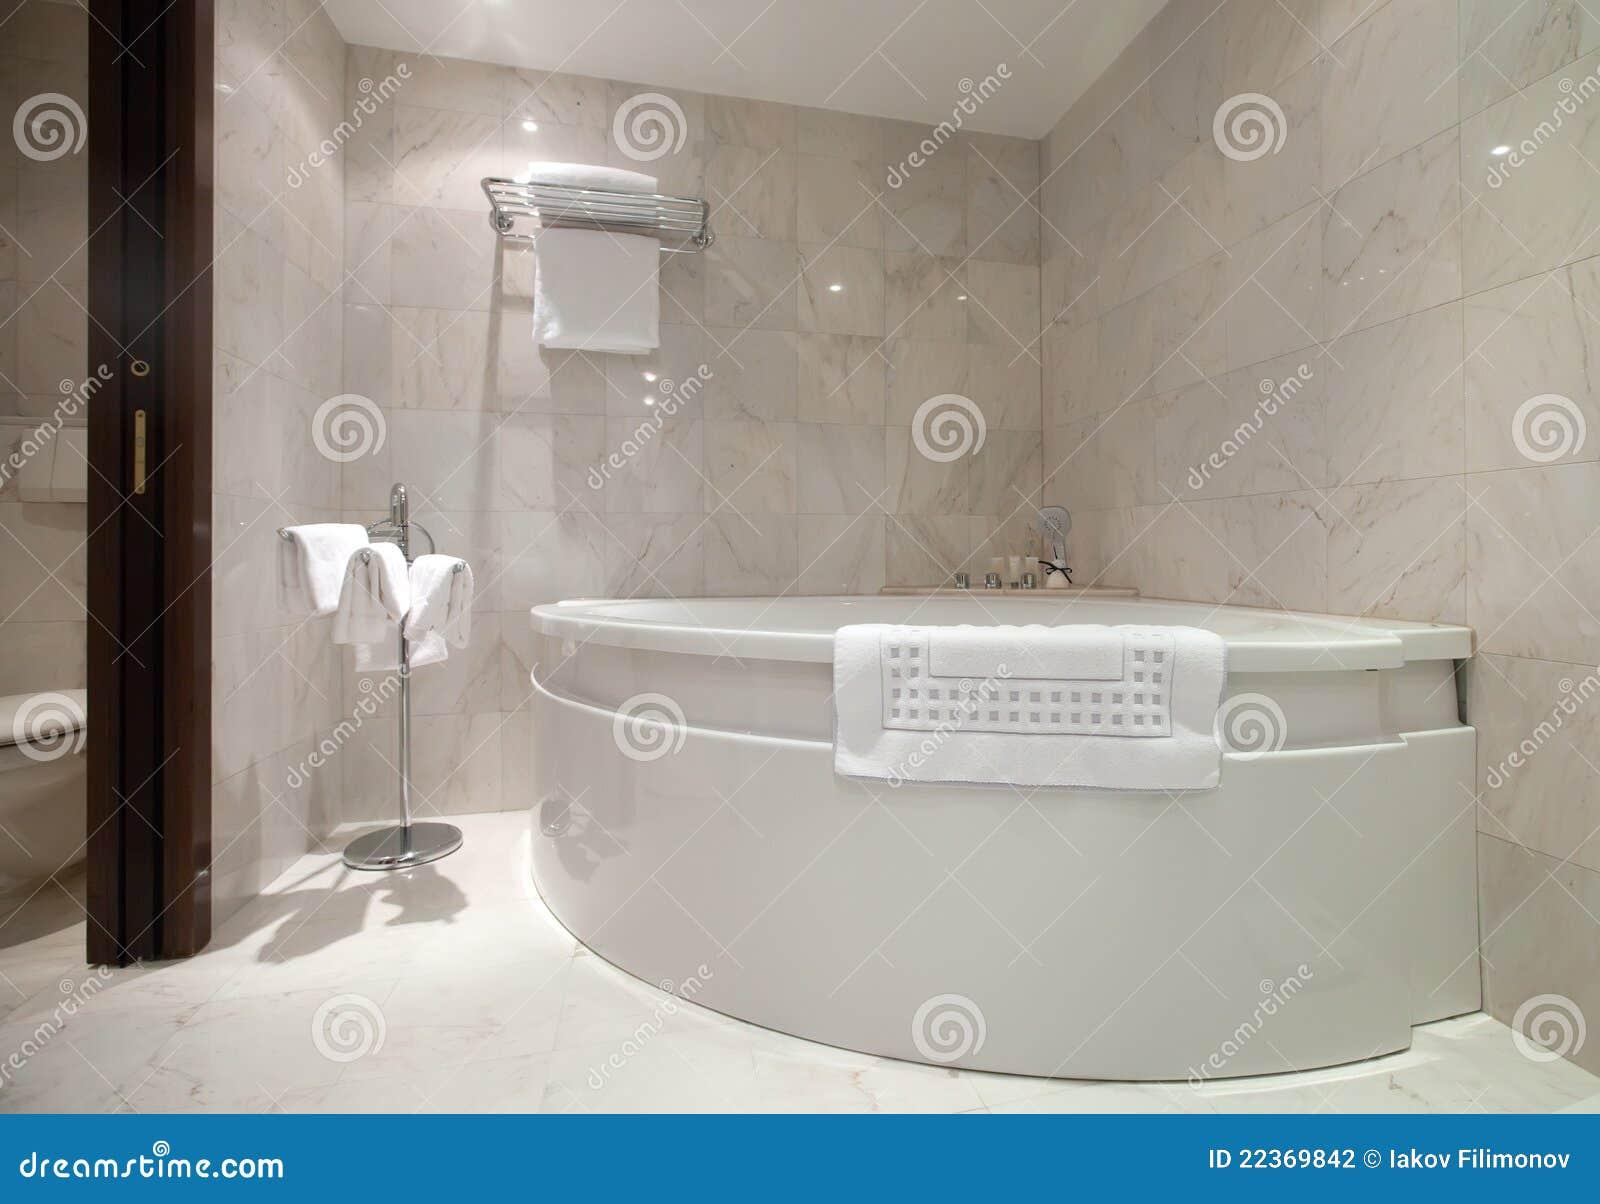 Salle de bains avec la baignoire faisante le coin photo for Desserte de salle de bain